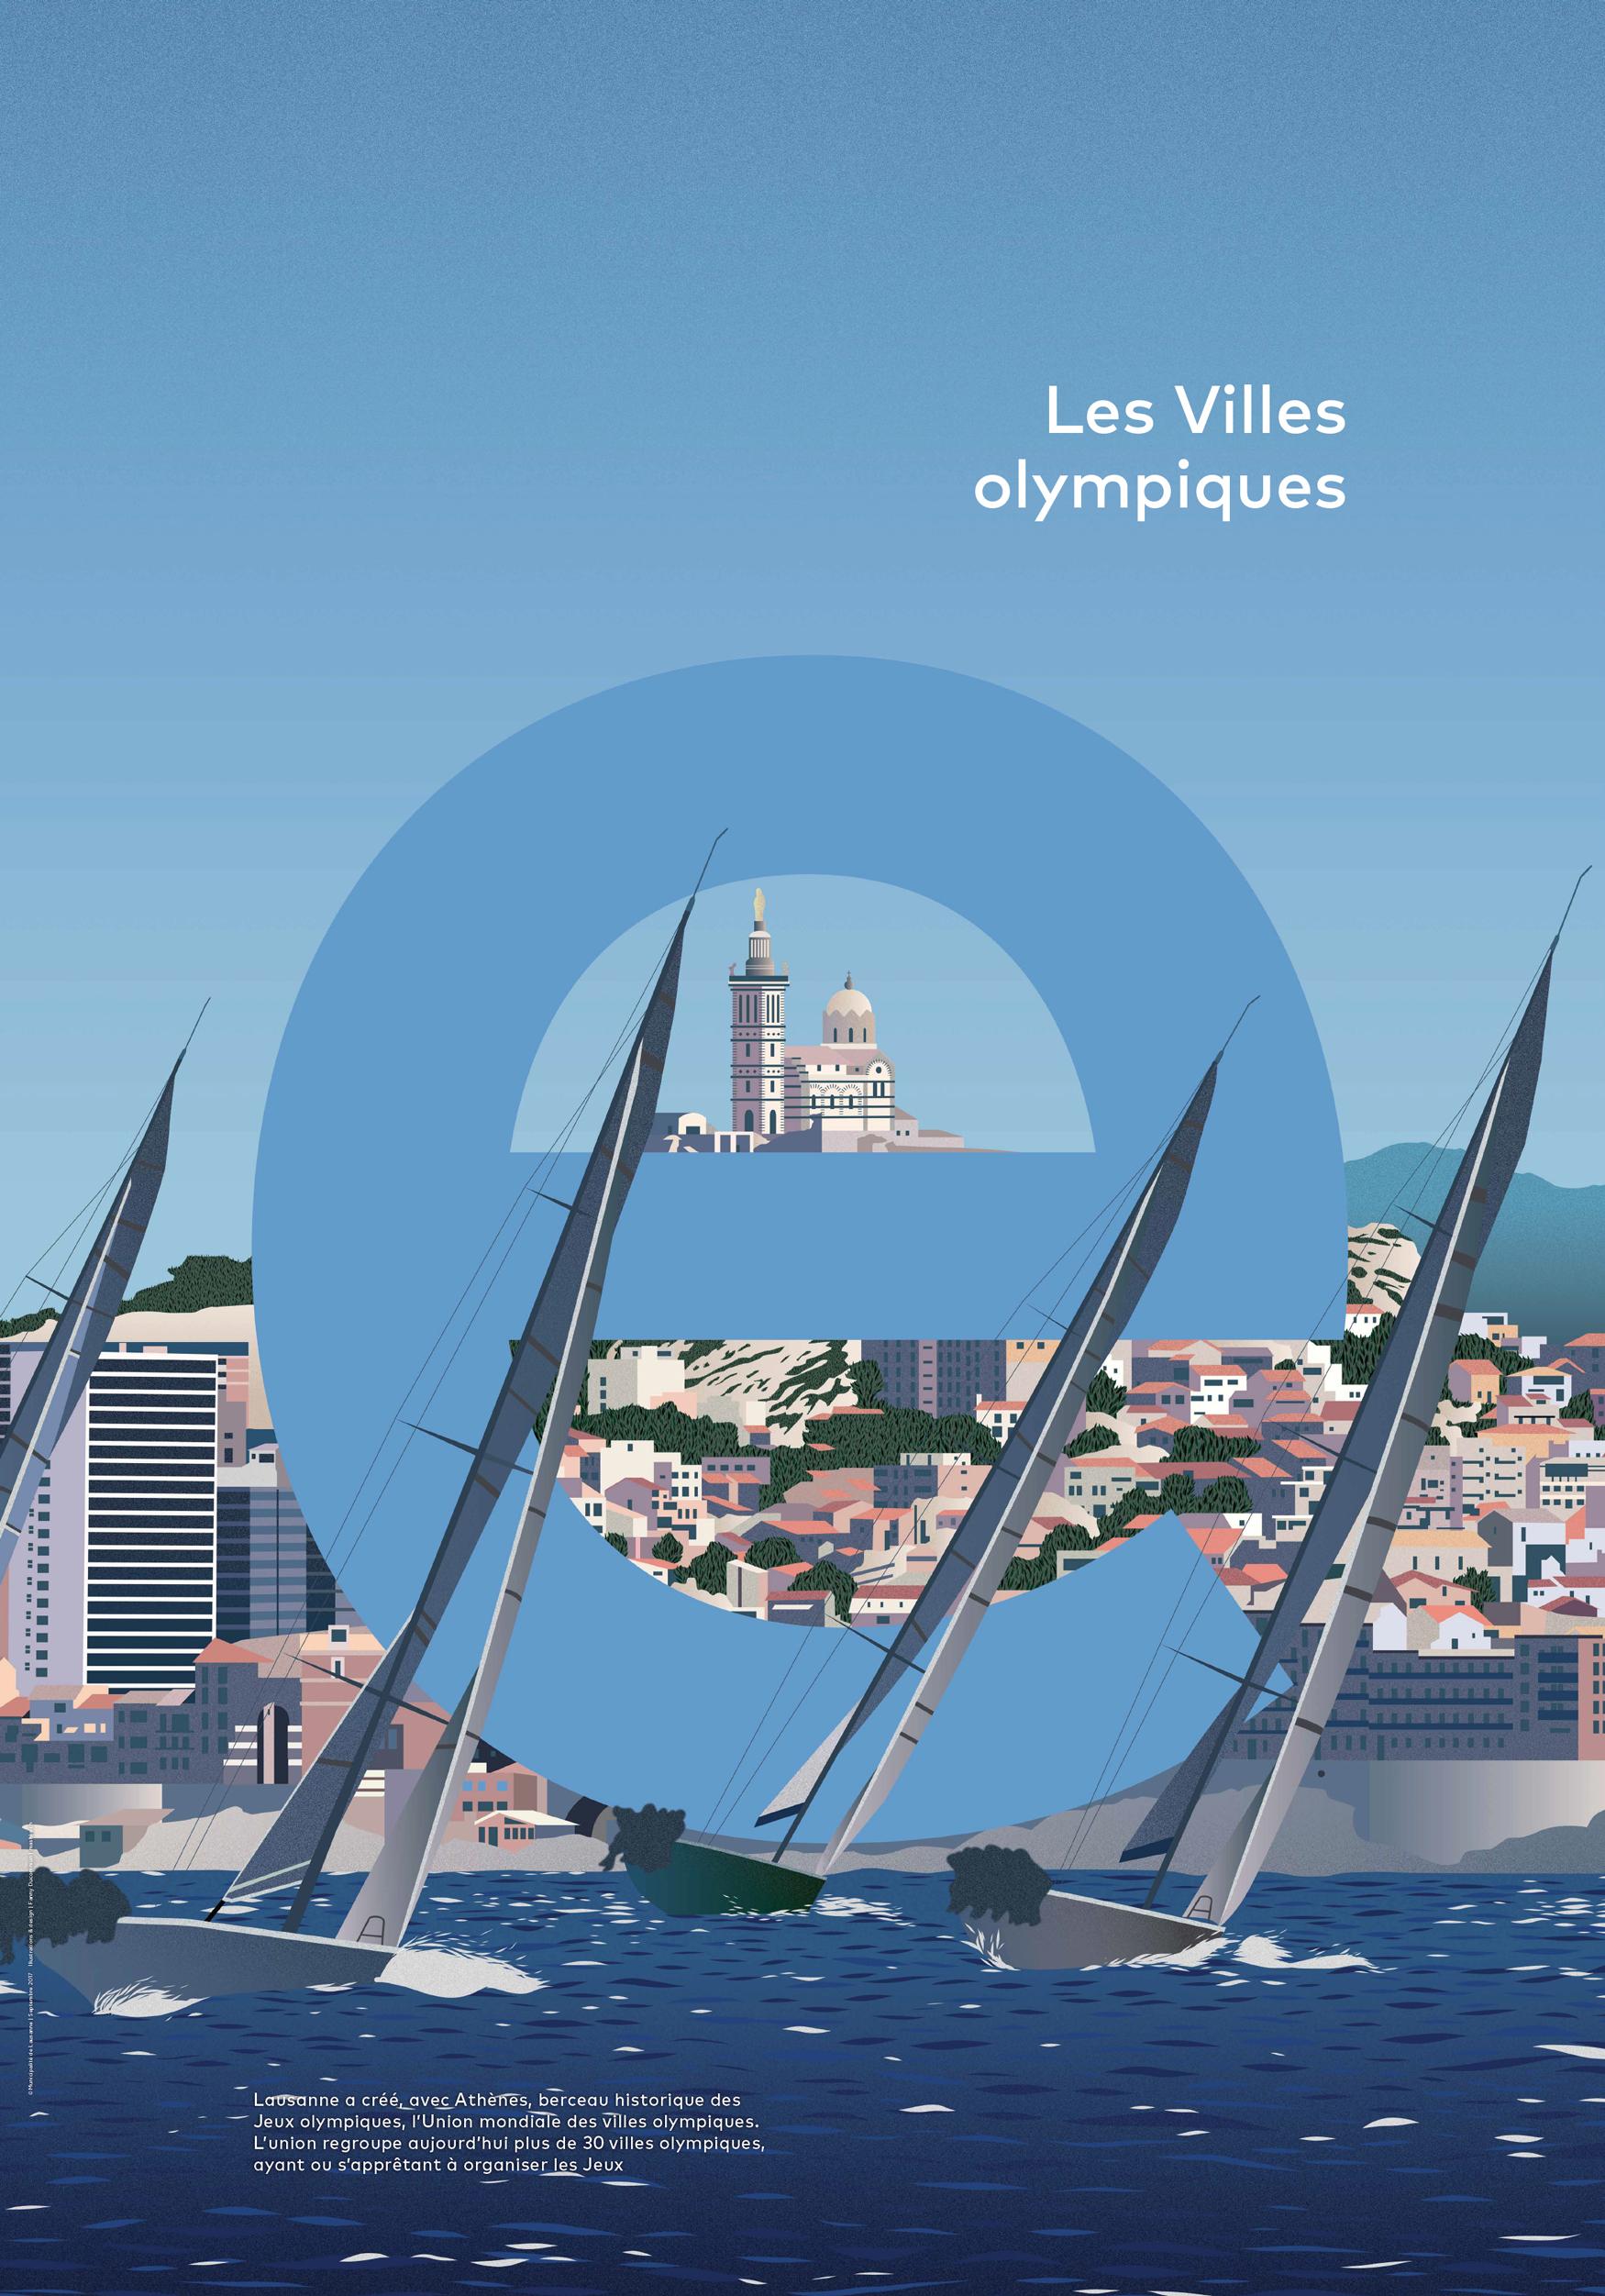 Mashka_VilledeLausanne_Lausanne-Marseille_site8.jpg